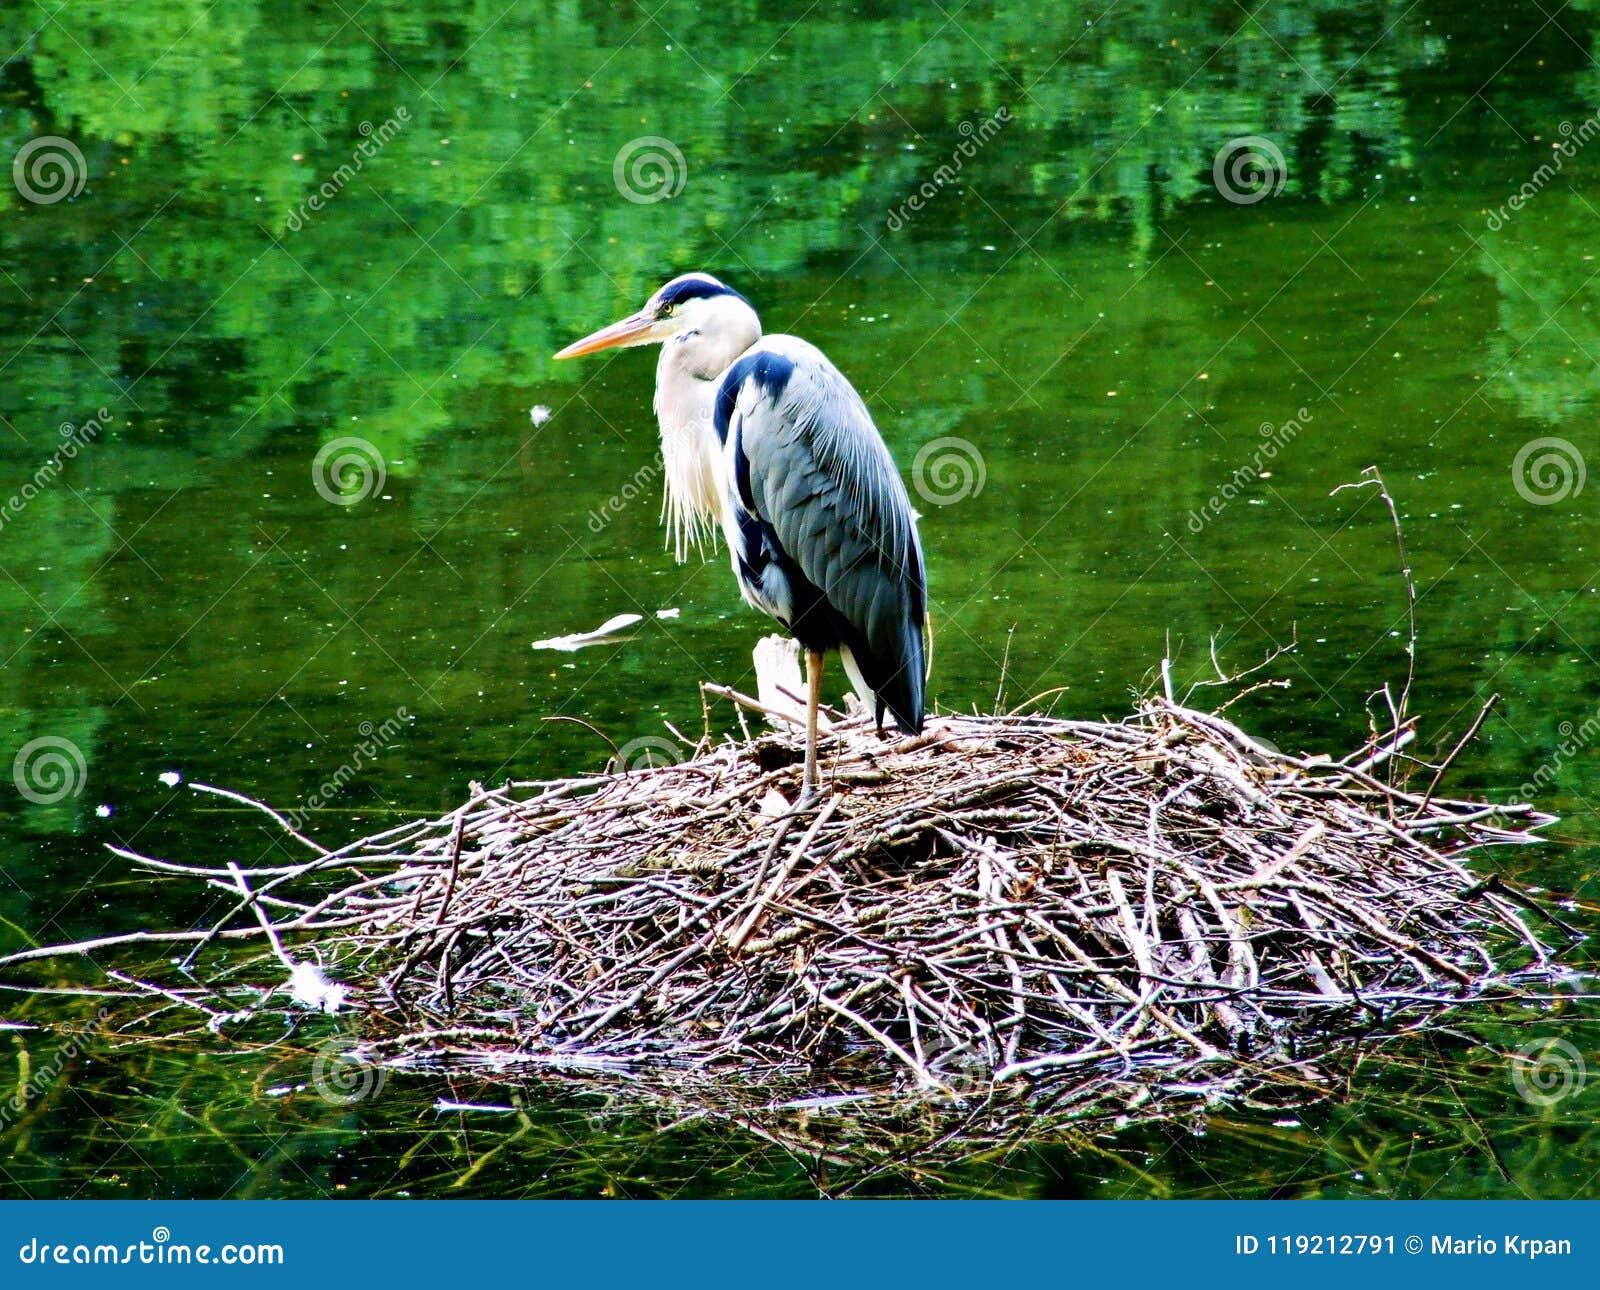 Pájaro, cigüeña, garza, naturaleza, animal, blanco, jerarquía, pájaros, fauna, agua, garceta, pico, salvaje, cigüeñas, pluma, ver